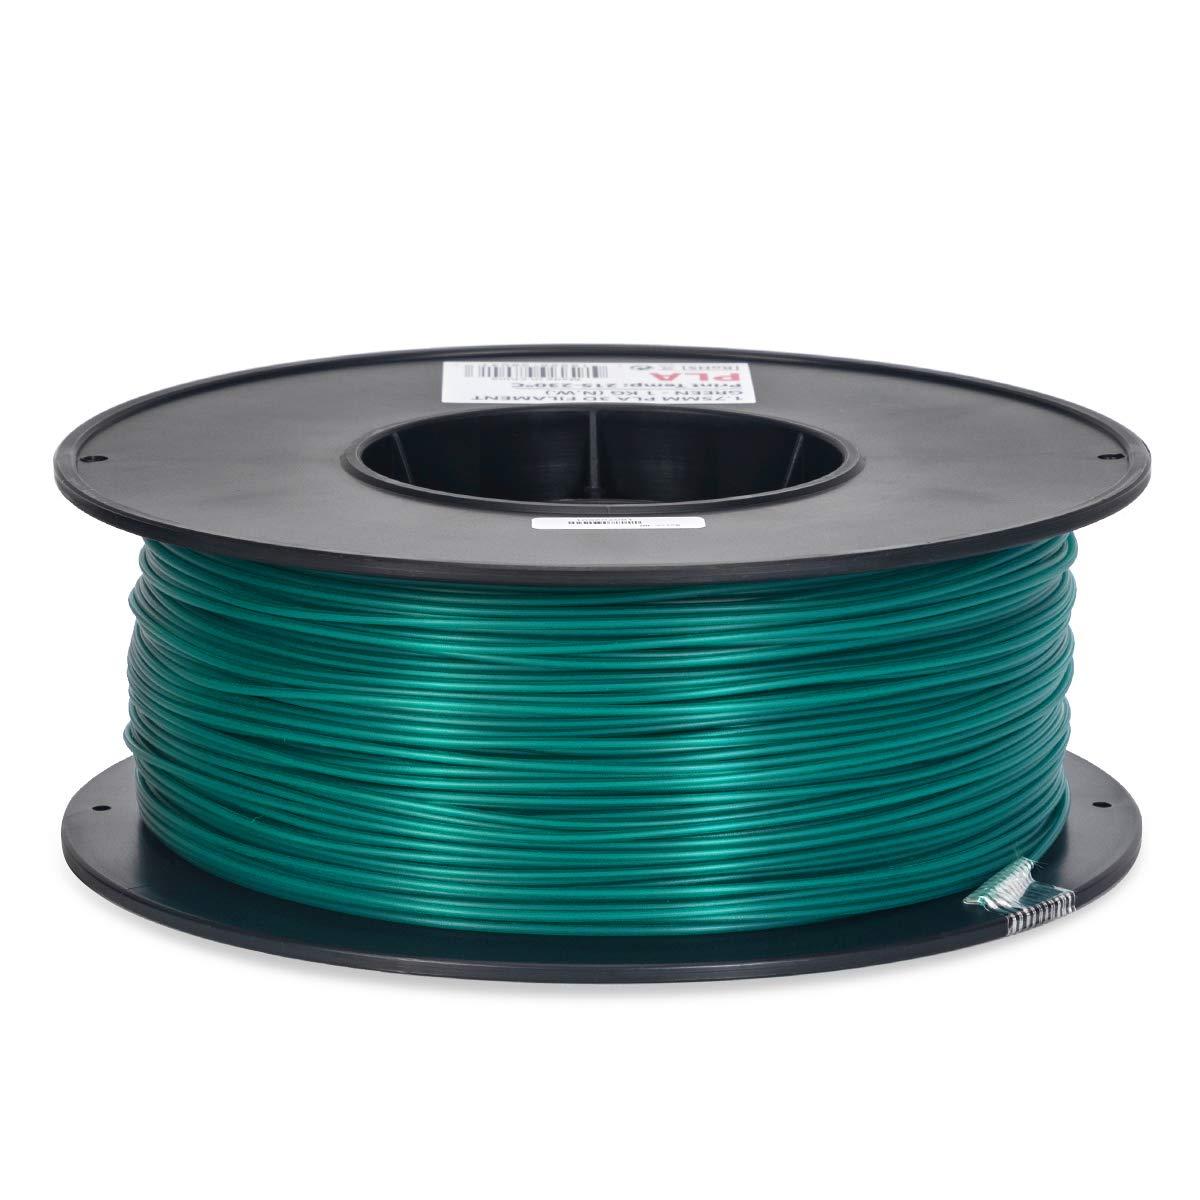 PLA Filament - 1.75 - Green - Inland